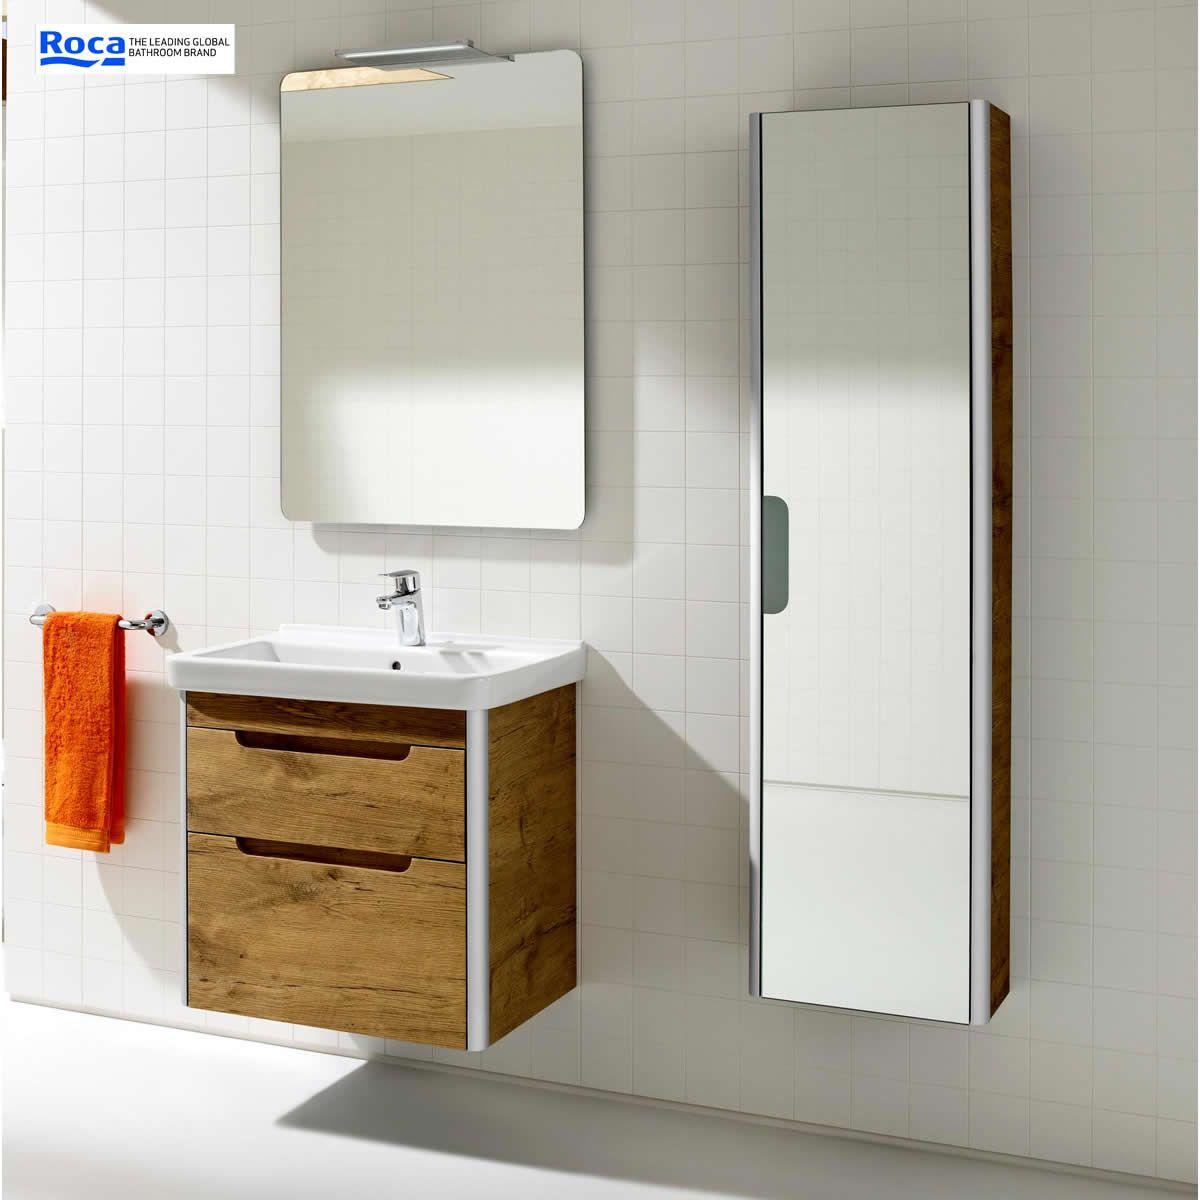 Roca dama n tall mirror column unit uk bathrooms for Roca bathroom fittings